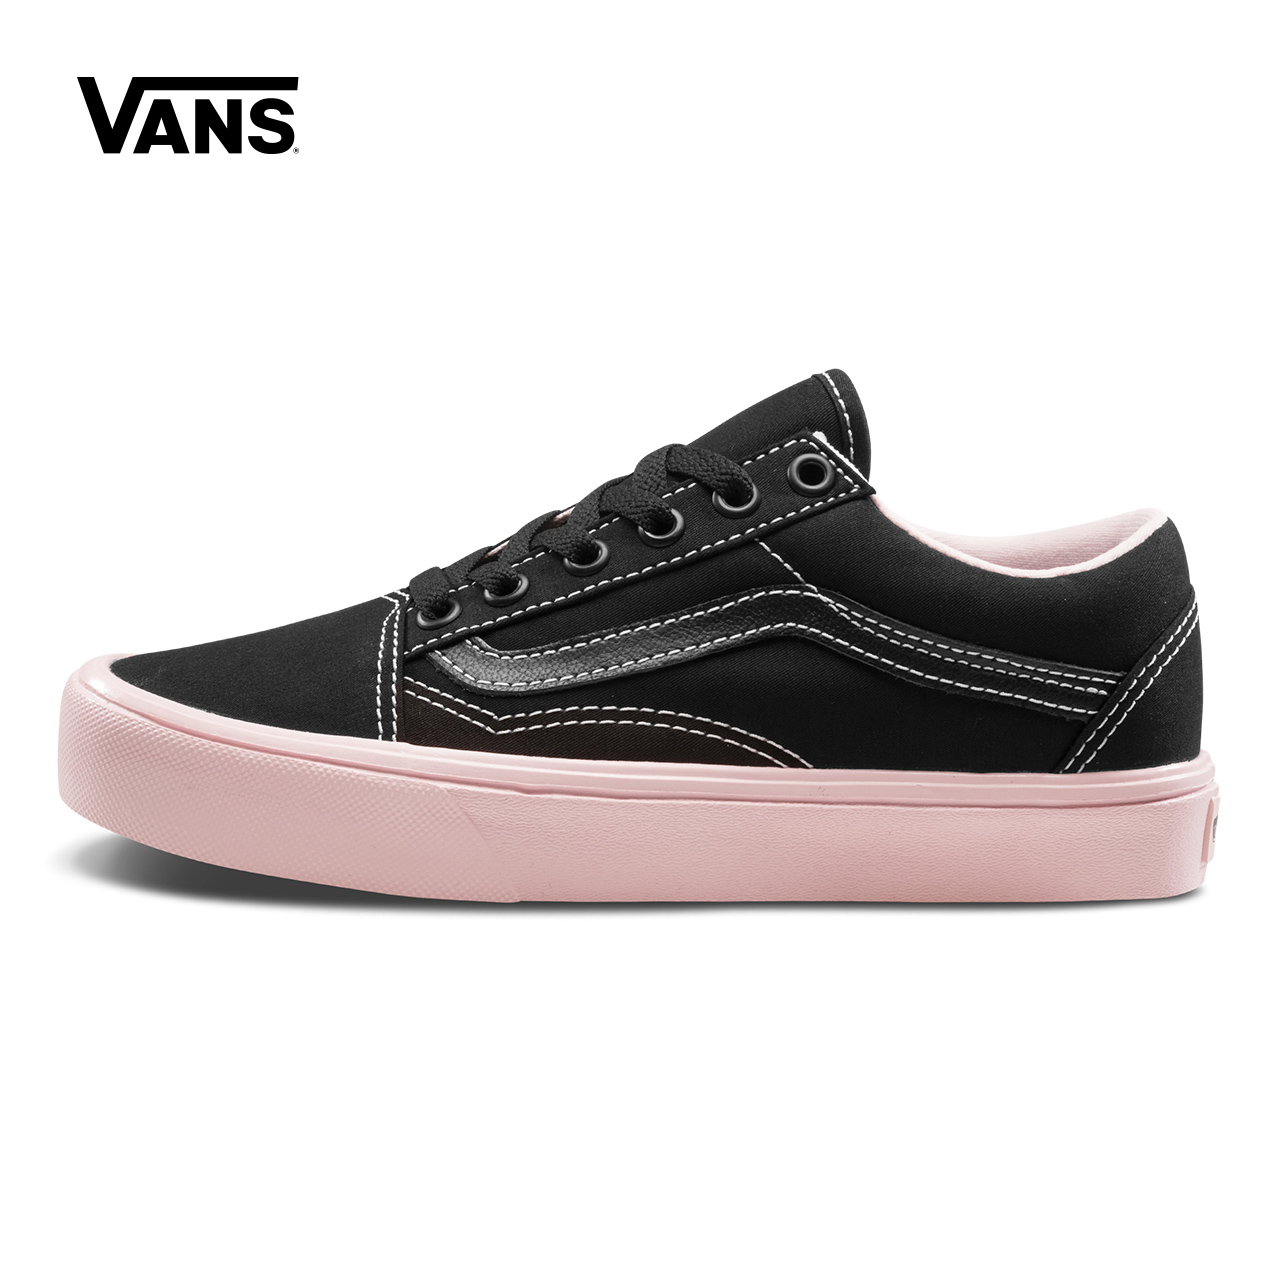 Original Black Pink Vans Sneakers Mens Womens Classic Old Skool Lite Skateboarding Shoes Sneakers Canvas Shoes VN0A2Z5WT1K